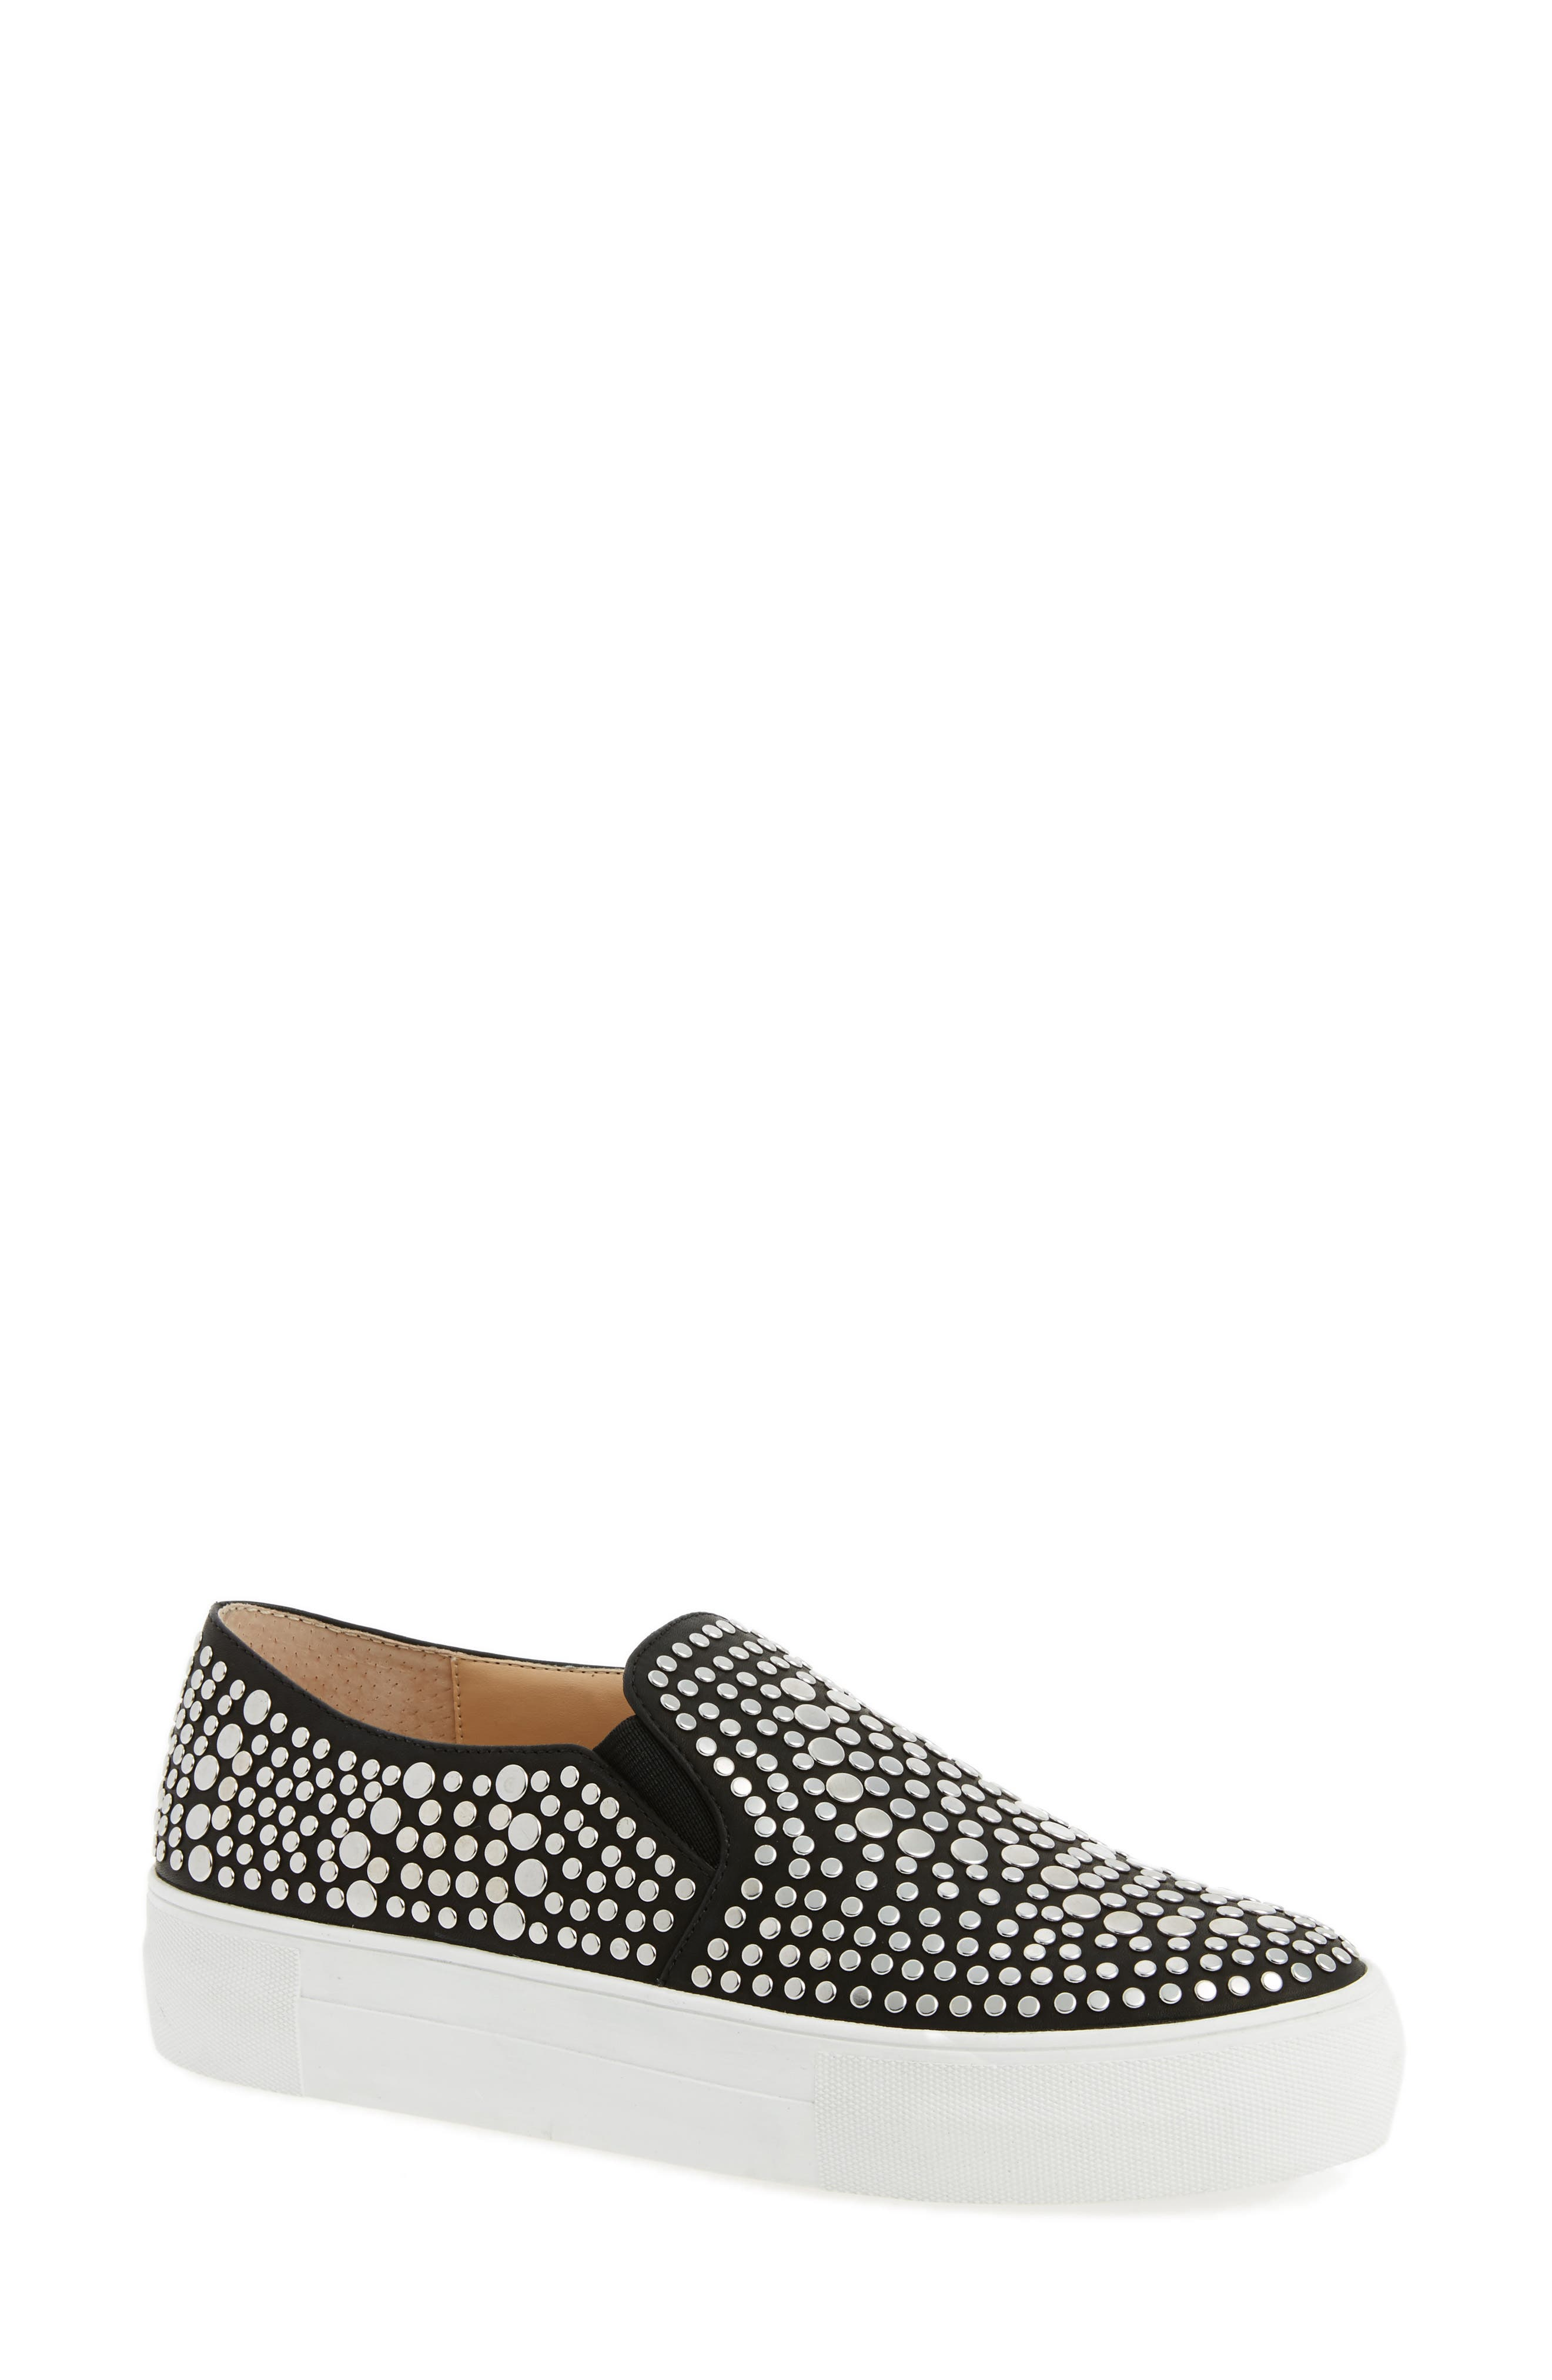 Alternate Image 1 Selected - Vince Camuto Kindra Studded Slip-On Sneaker (Women)